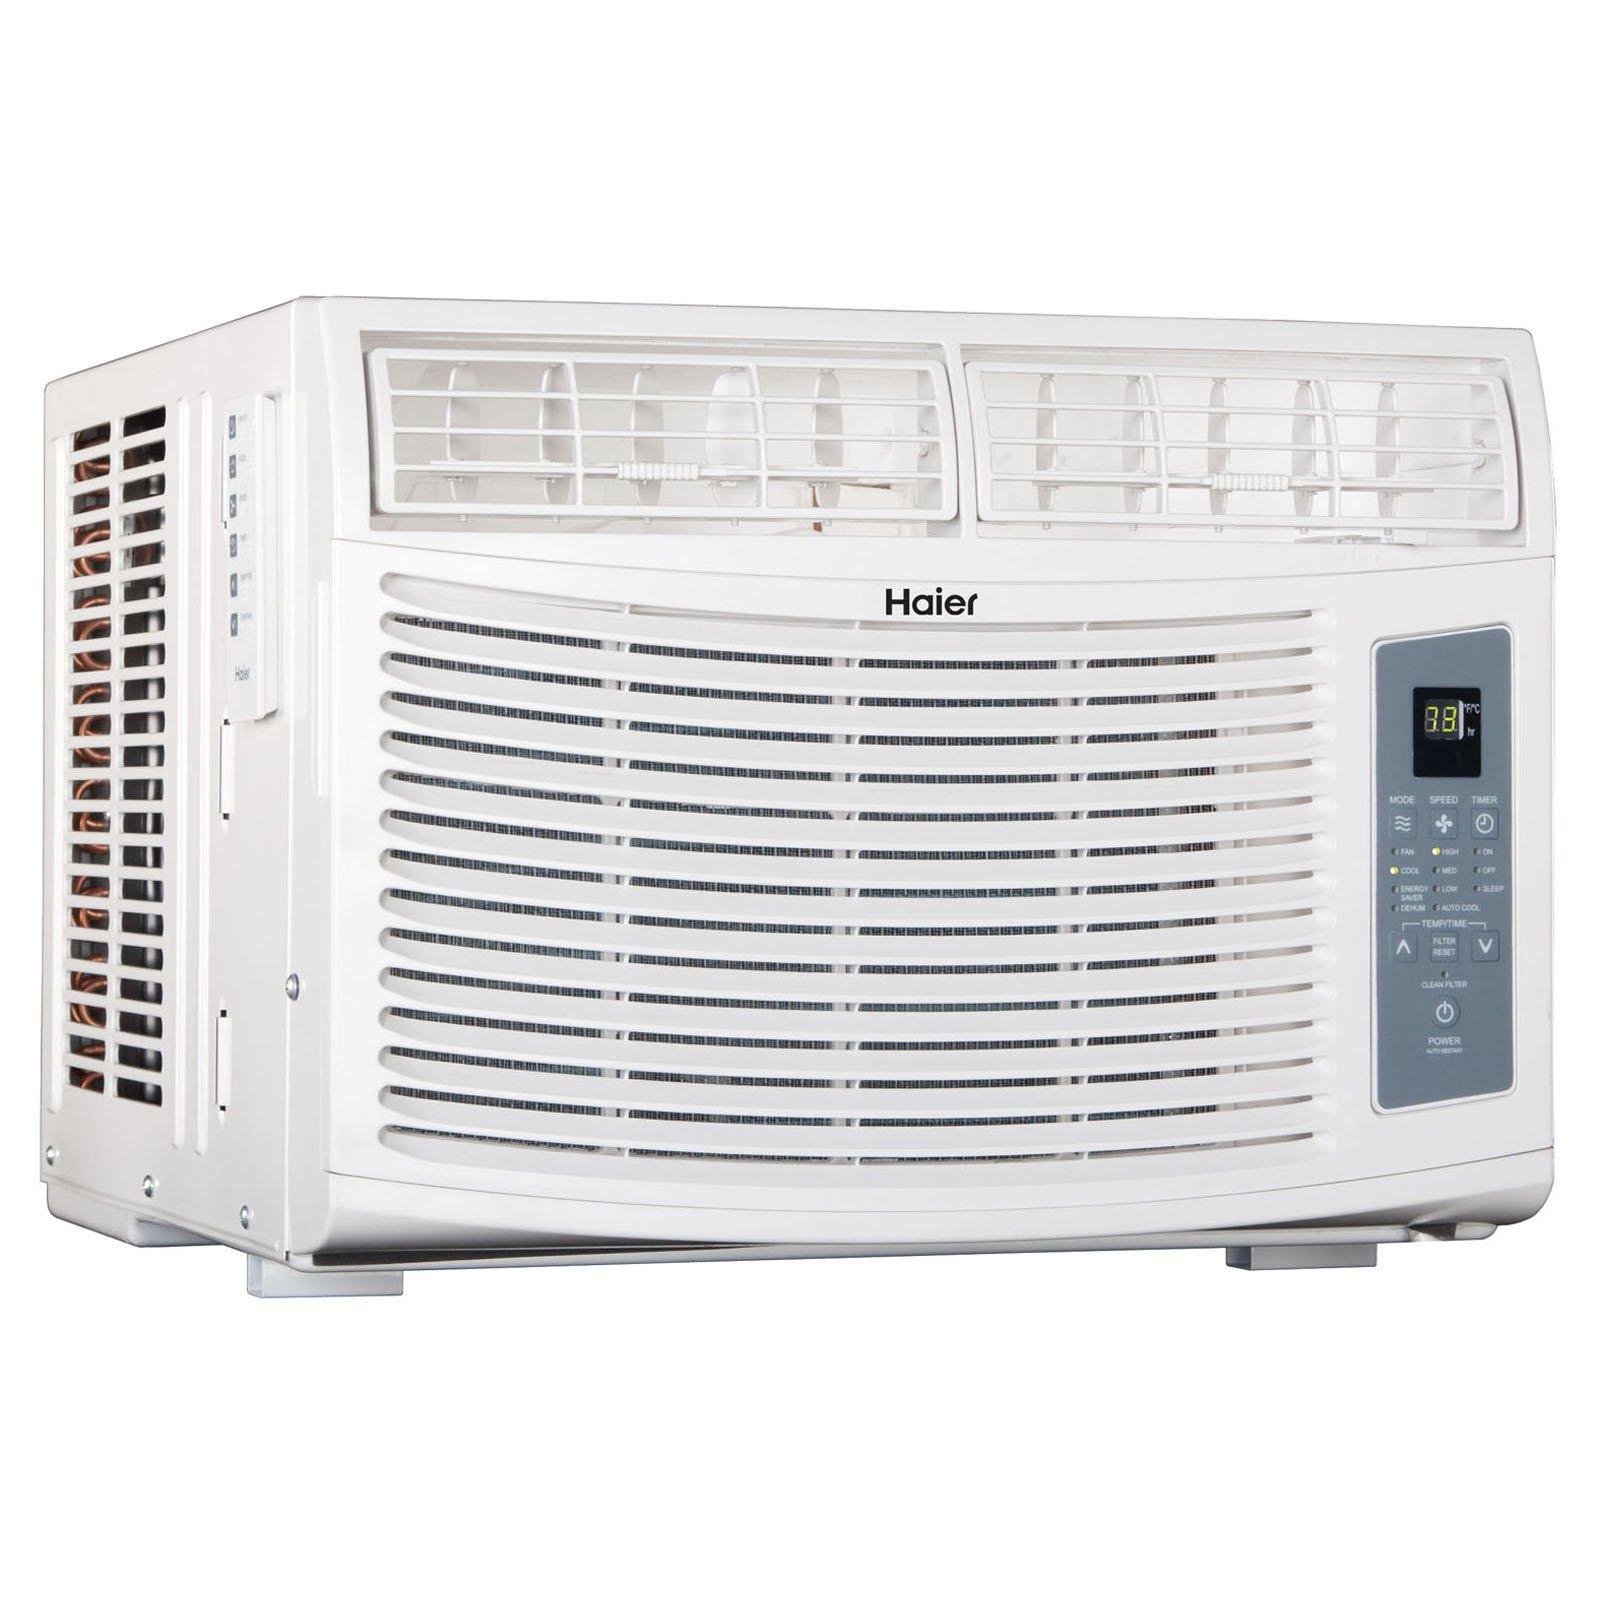 Haier 10000 BTU 115V Window-Mounted Air Conditioner